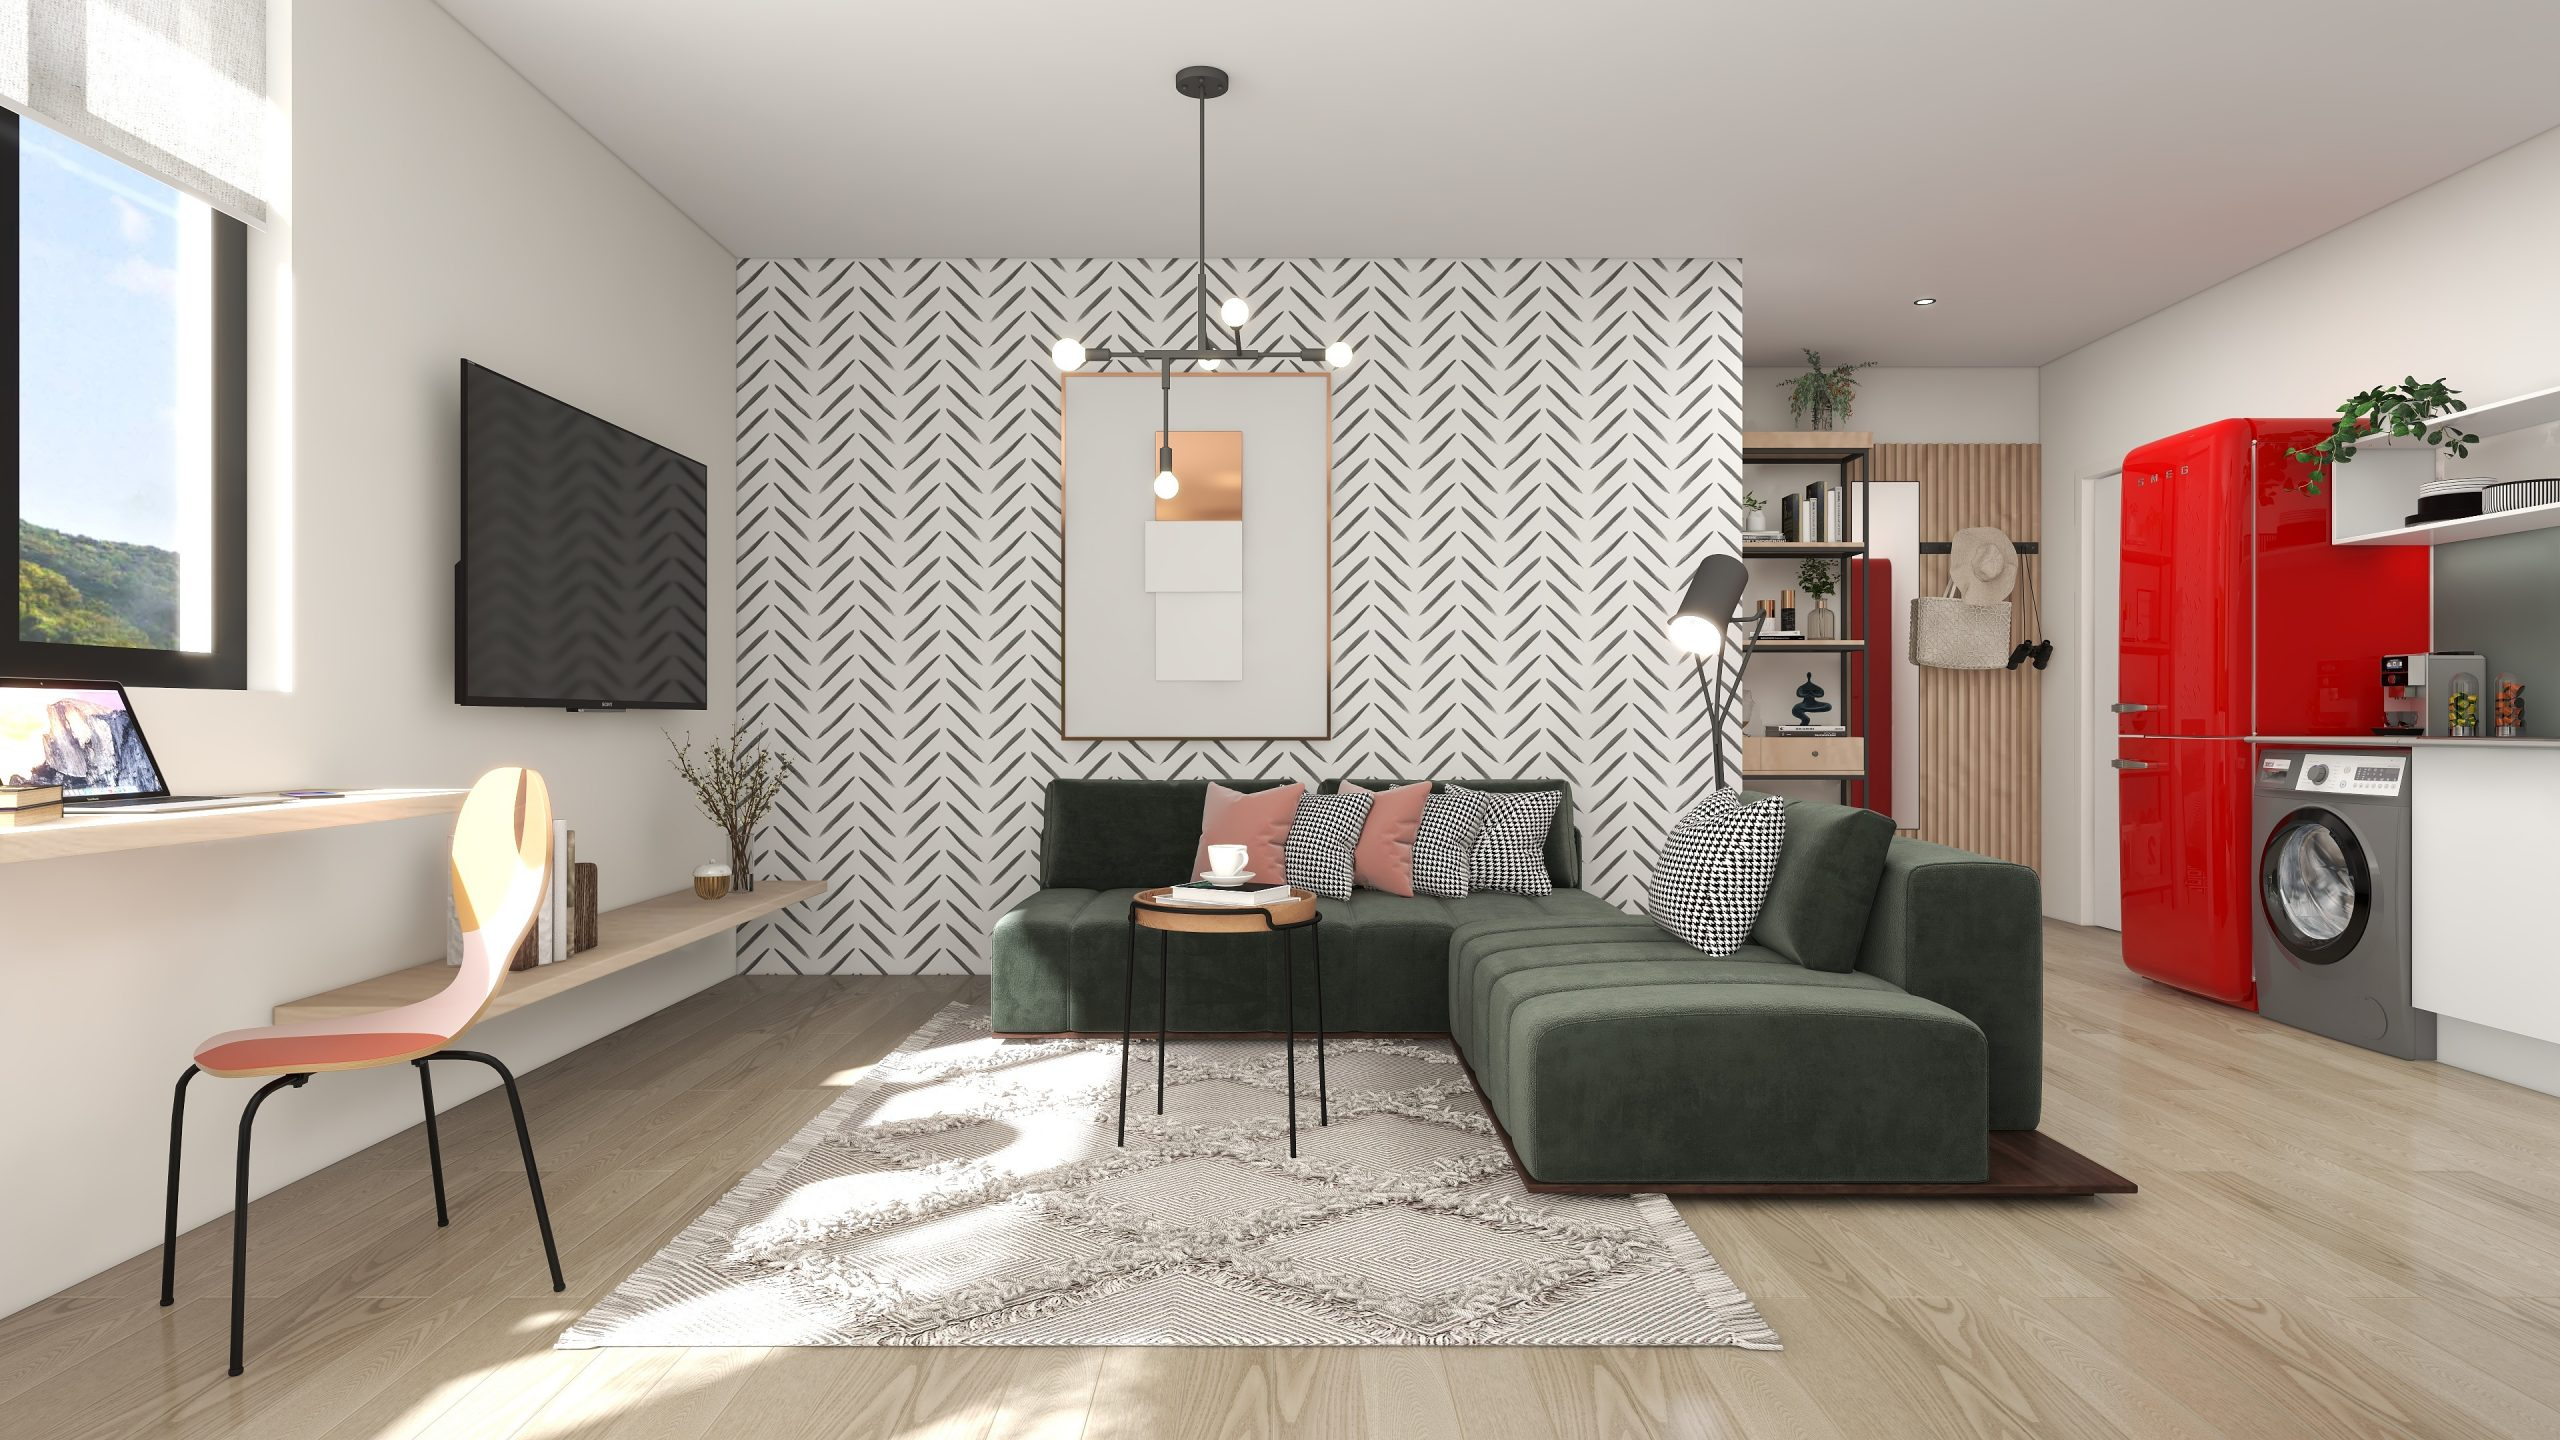 PineworX apartments interior